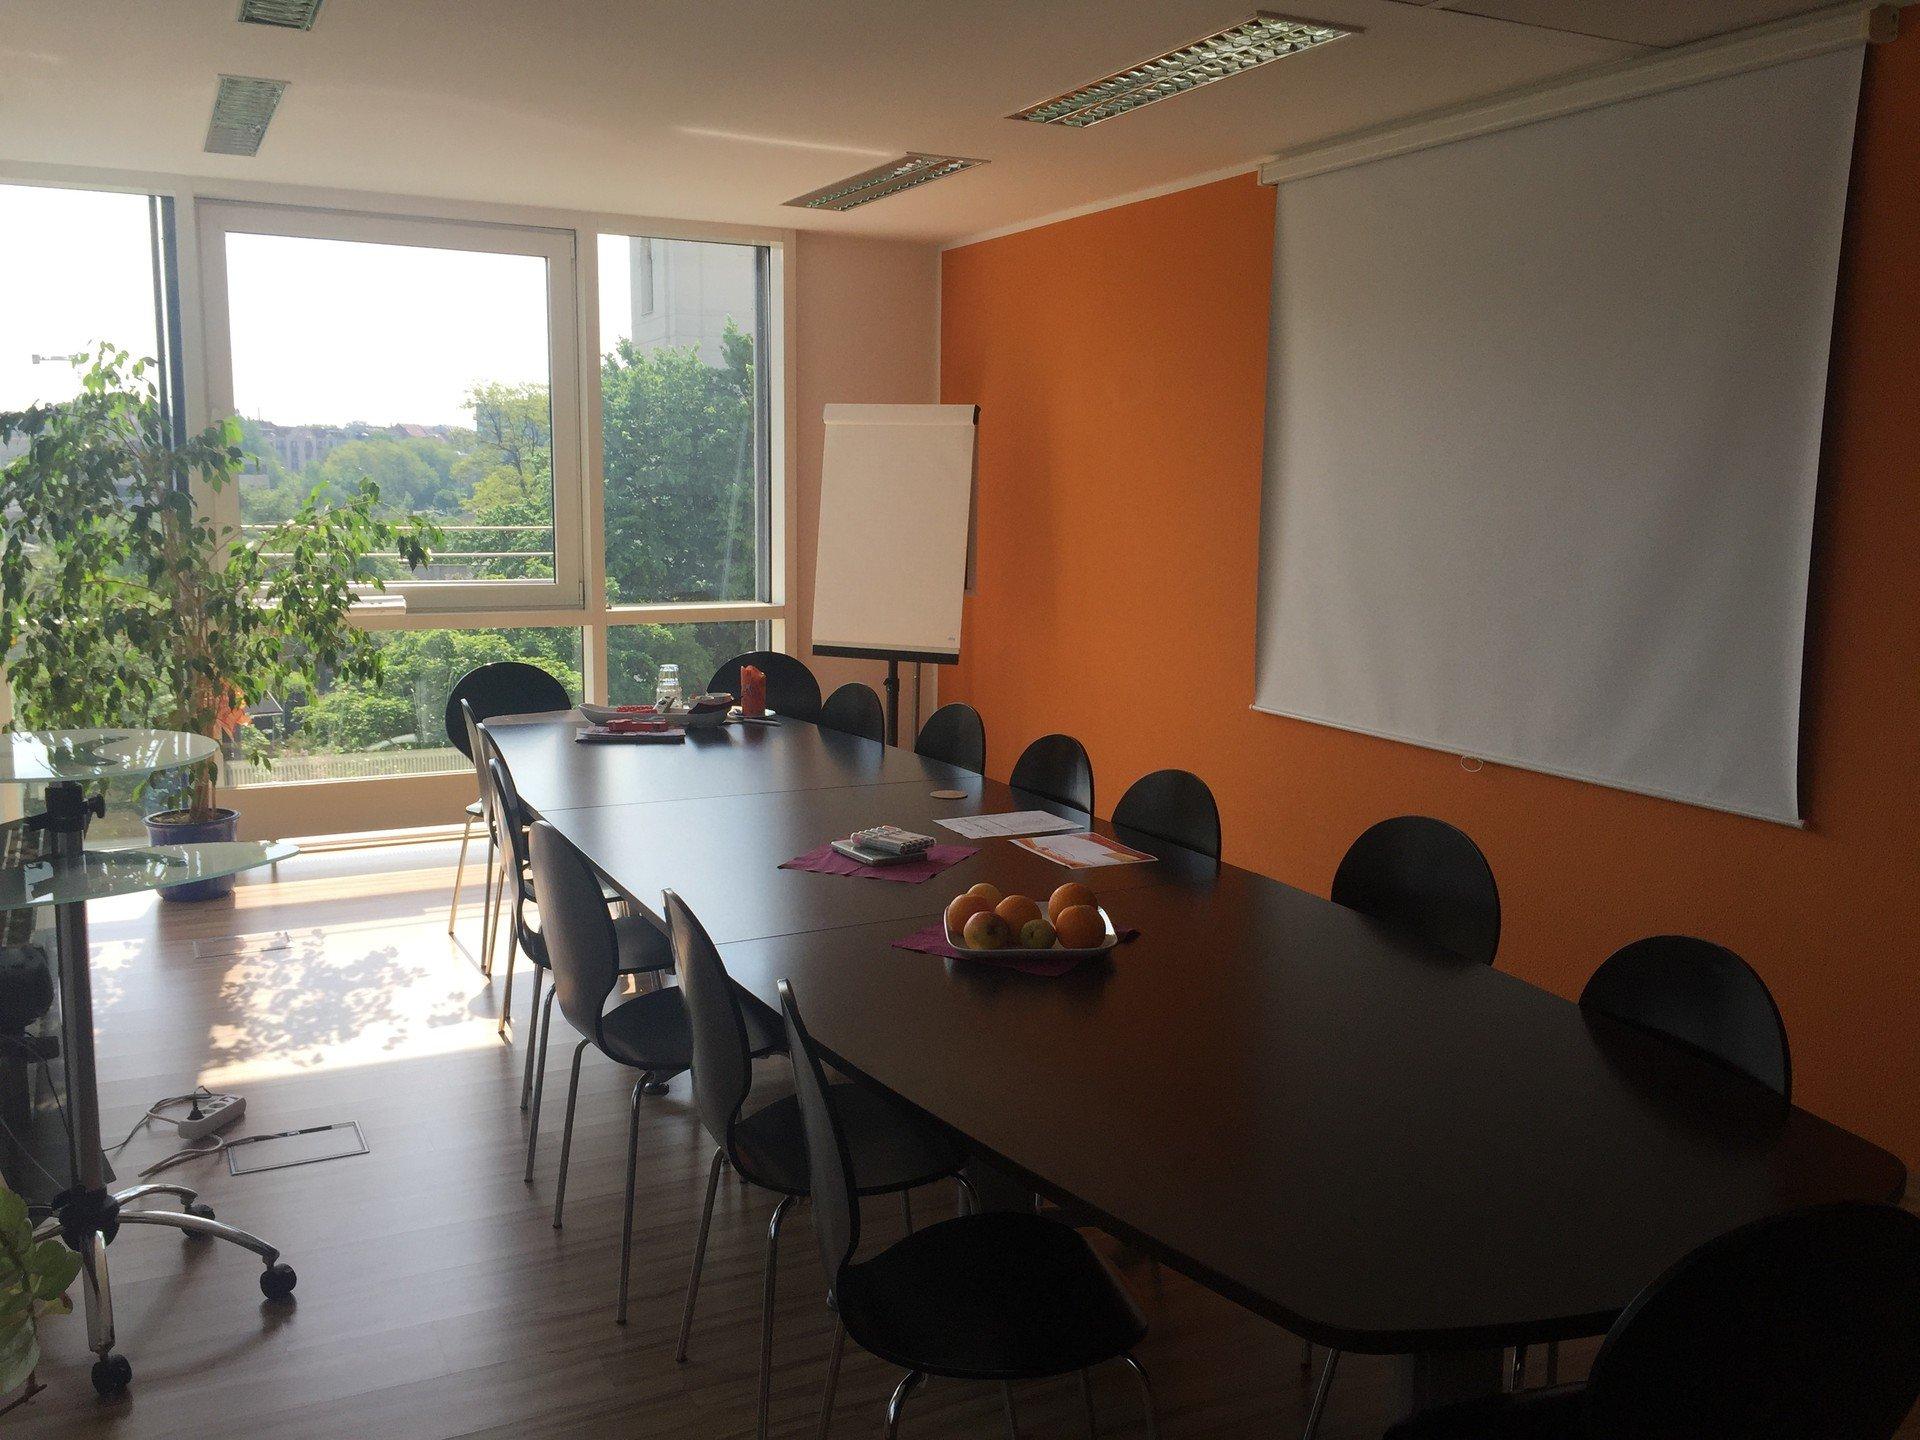 Leipzig  Meetingraum Seminarraum inkl. Ausstattung Leipzig-Zentrum image 0